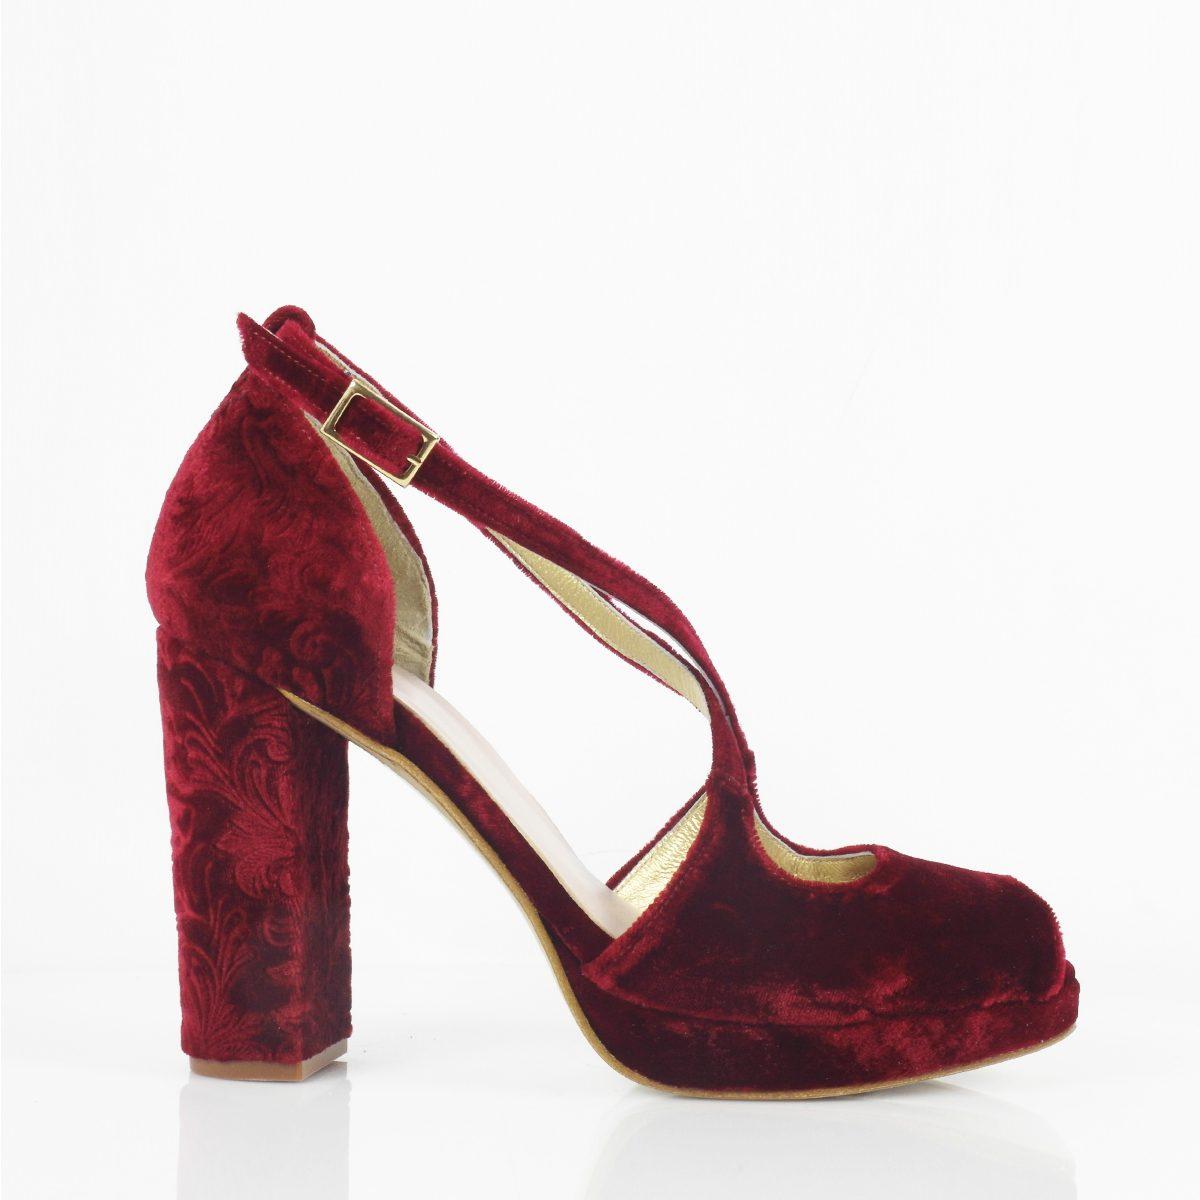 SANDALIA MOD.9735 (10cm) - Zapatos Personalizados Fiesta